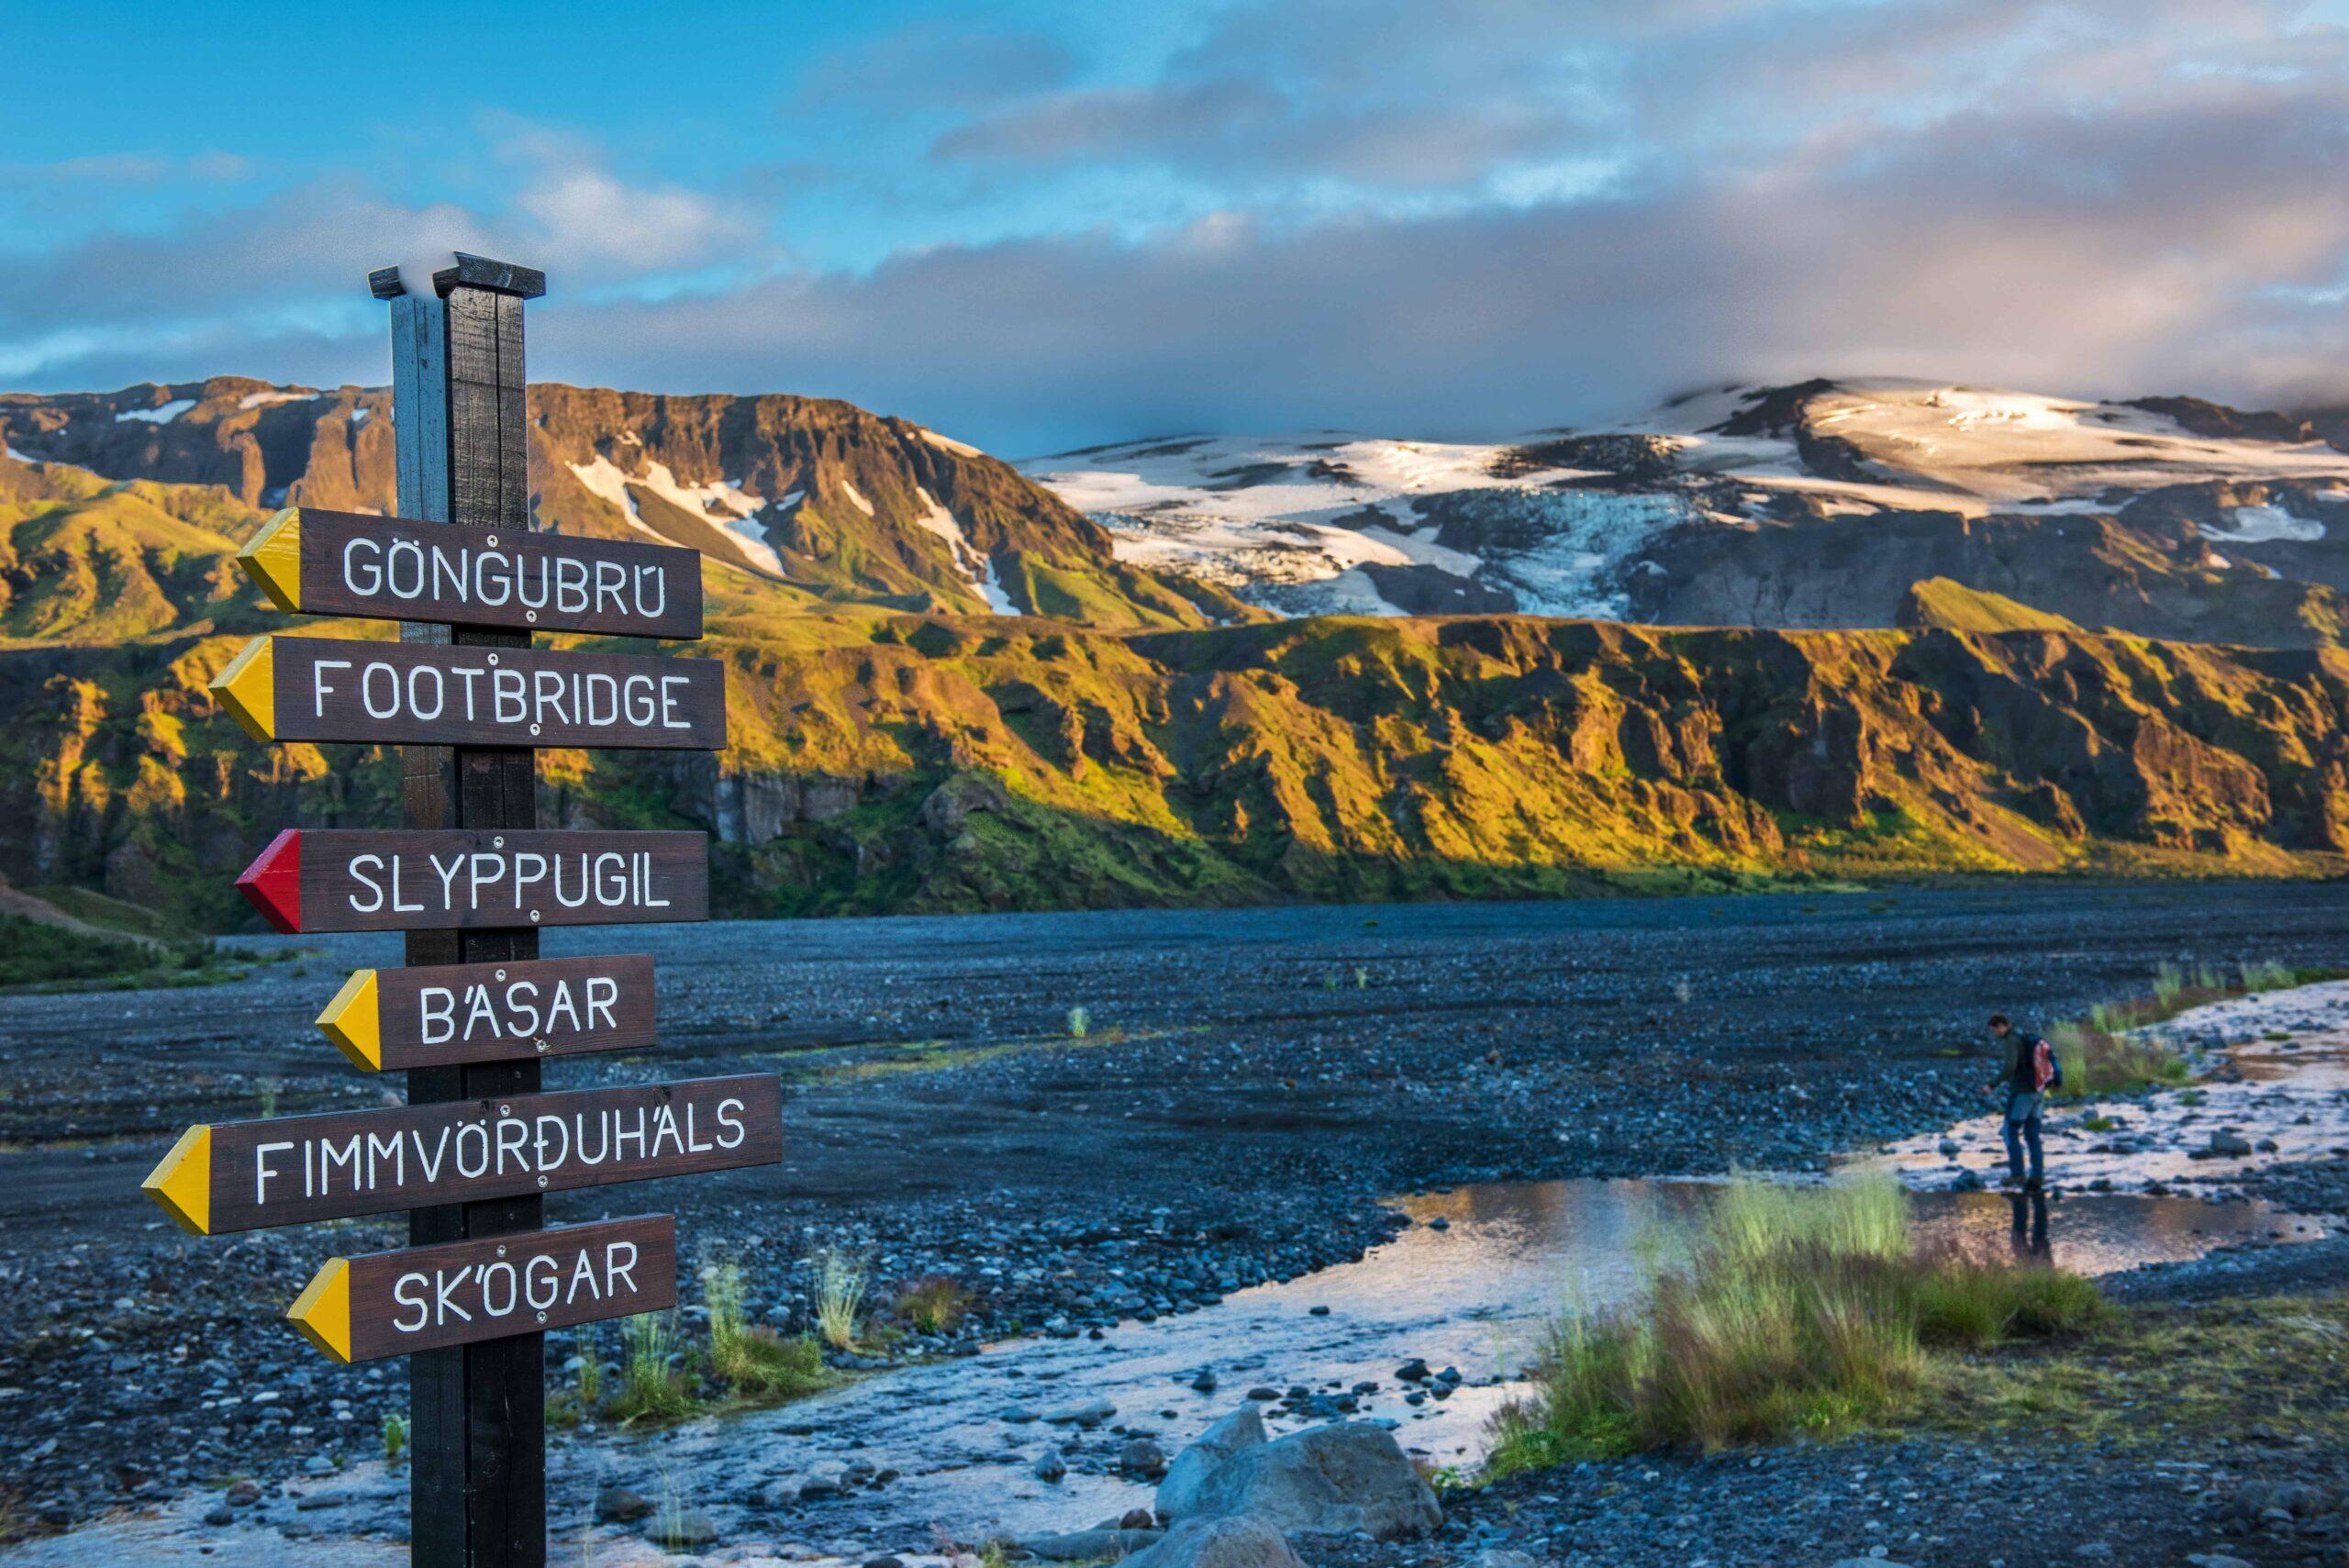 Hiking in Þórsmörk, hiking signs in Þórsmörk